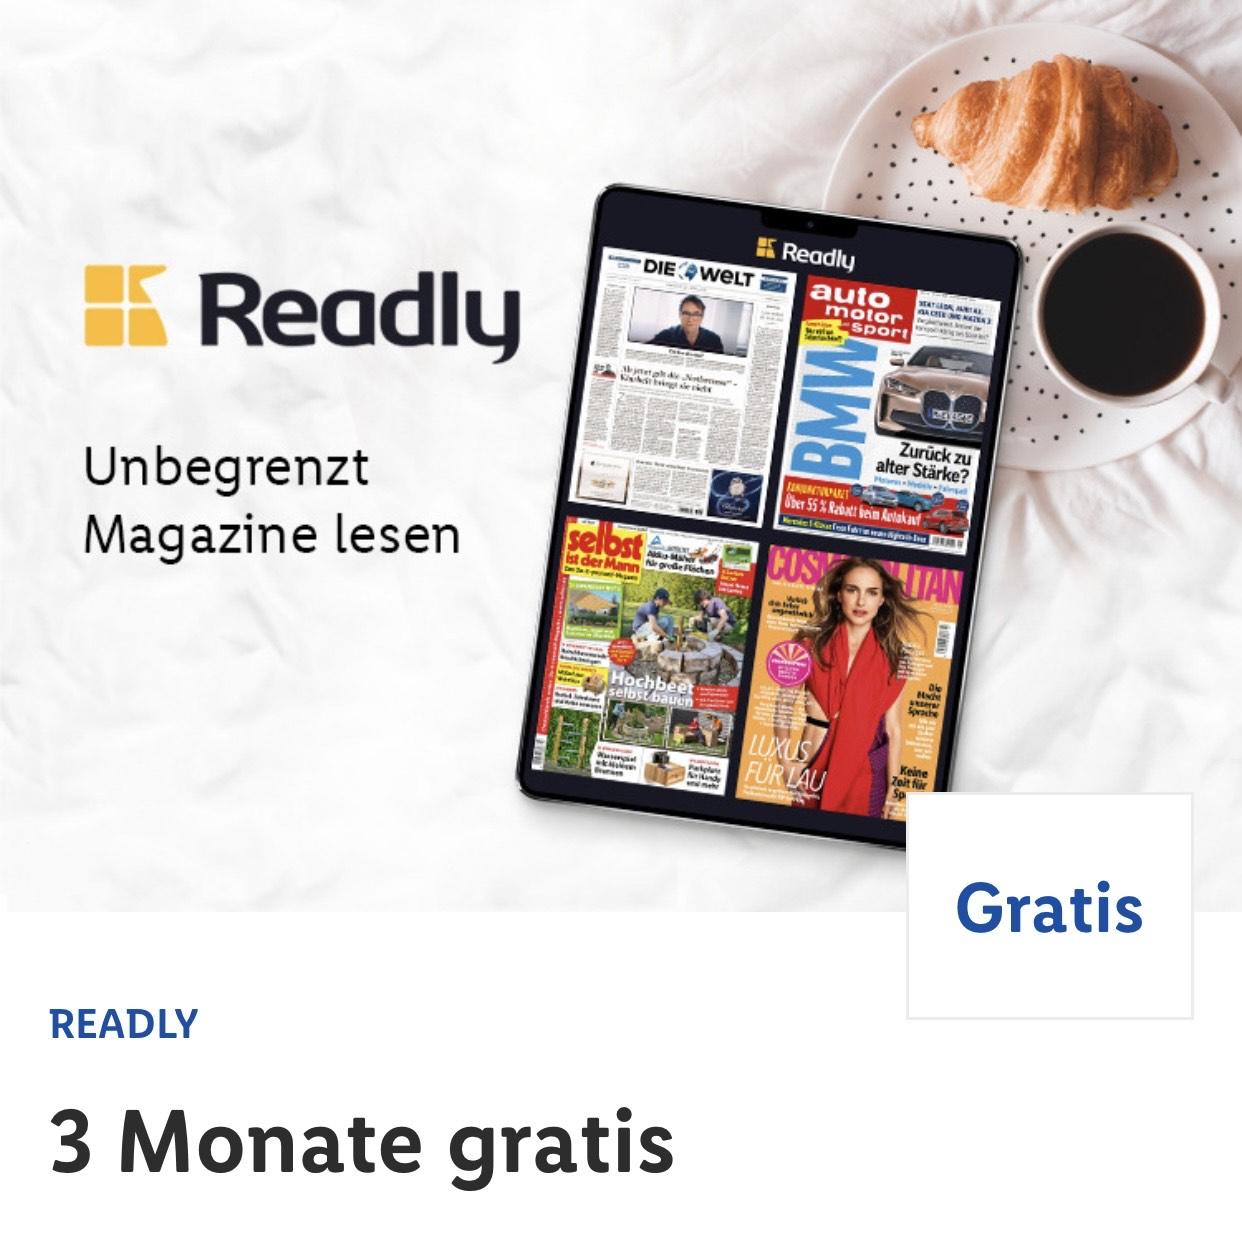 [Lidl] Readly 3 Monate Gratis! (Neukunden)